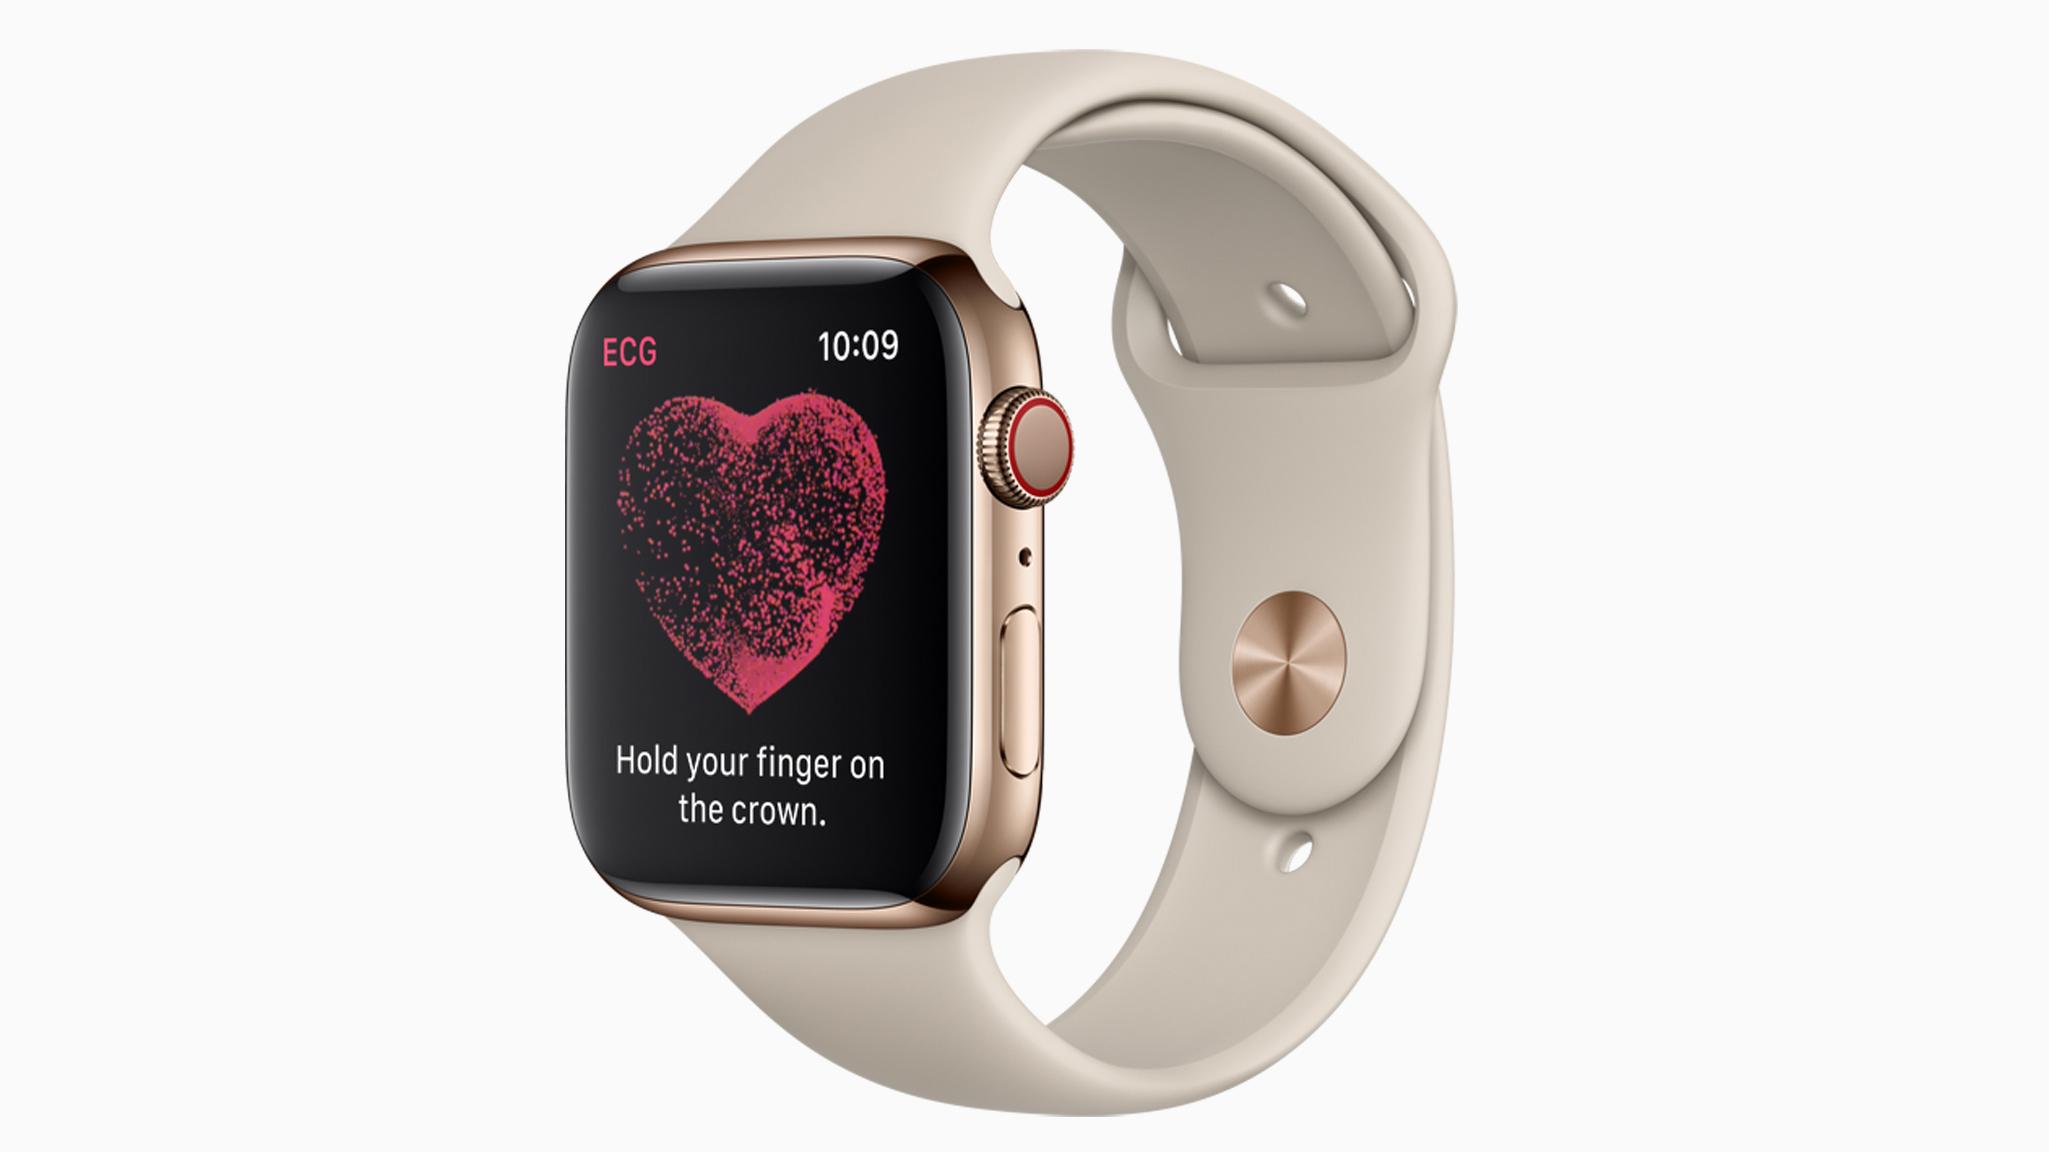 Apple Watch Series 4 gets ECG support